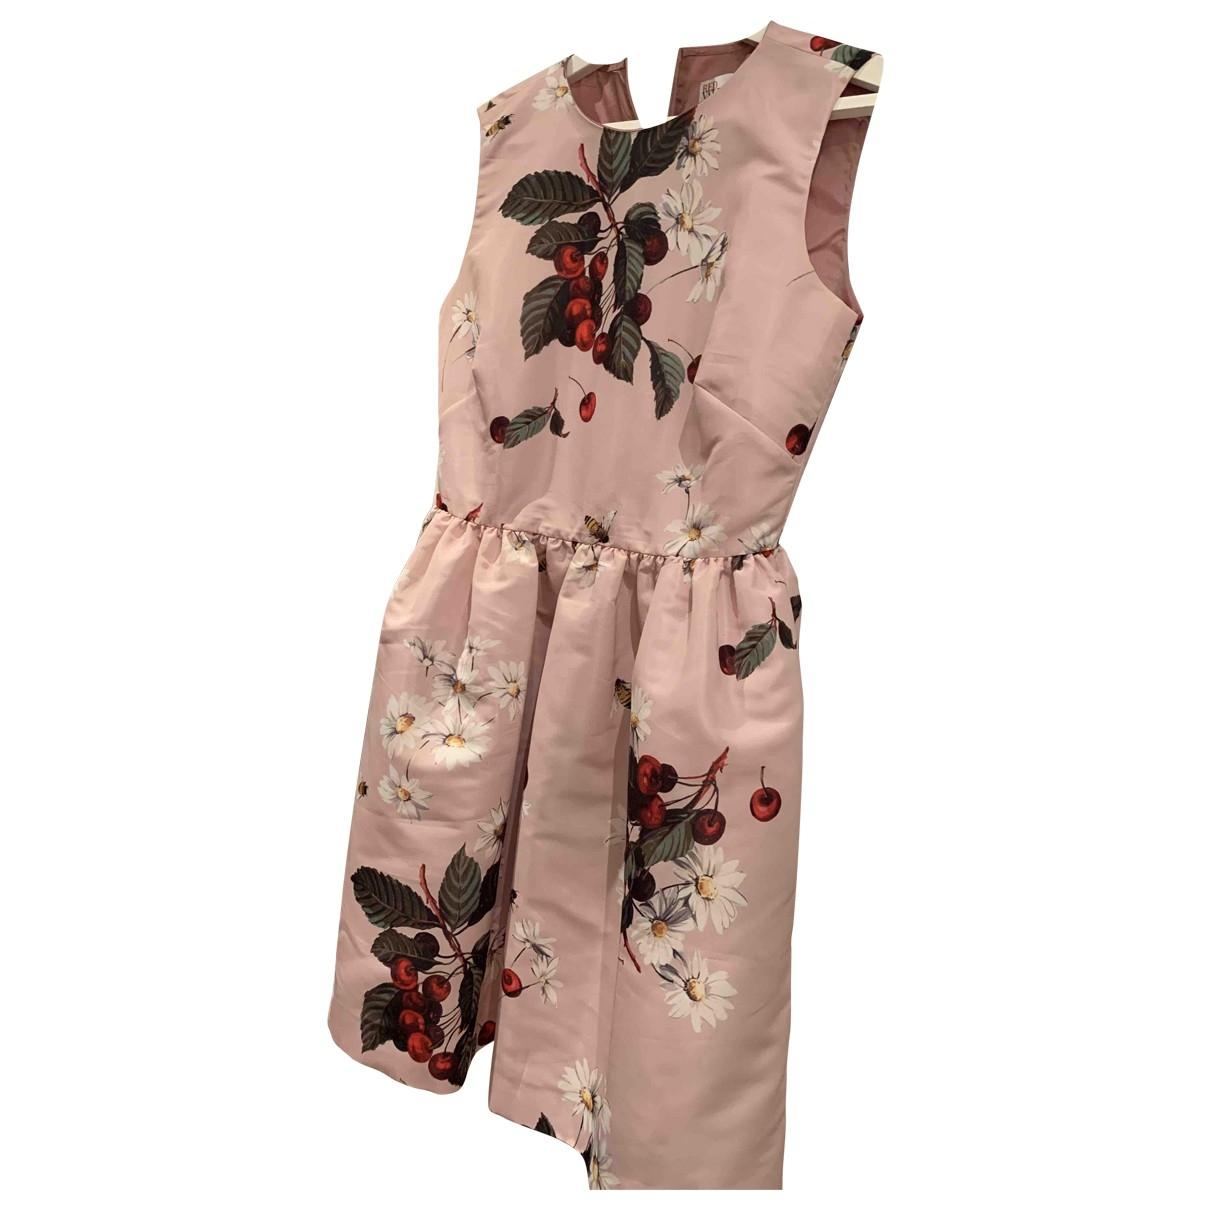 Red Valentino Garavani \N Pink dress for Women 40 IT